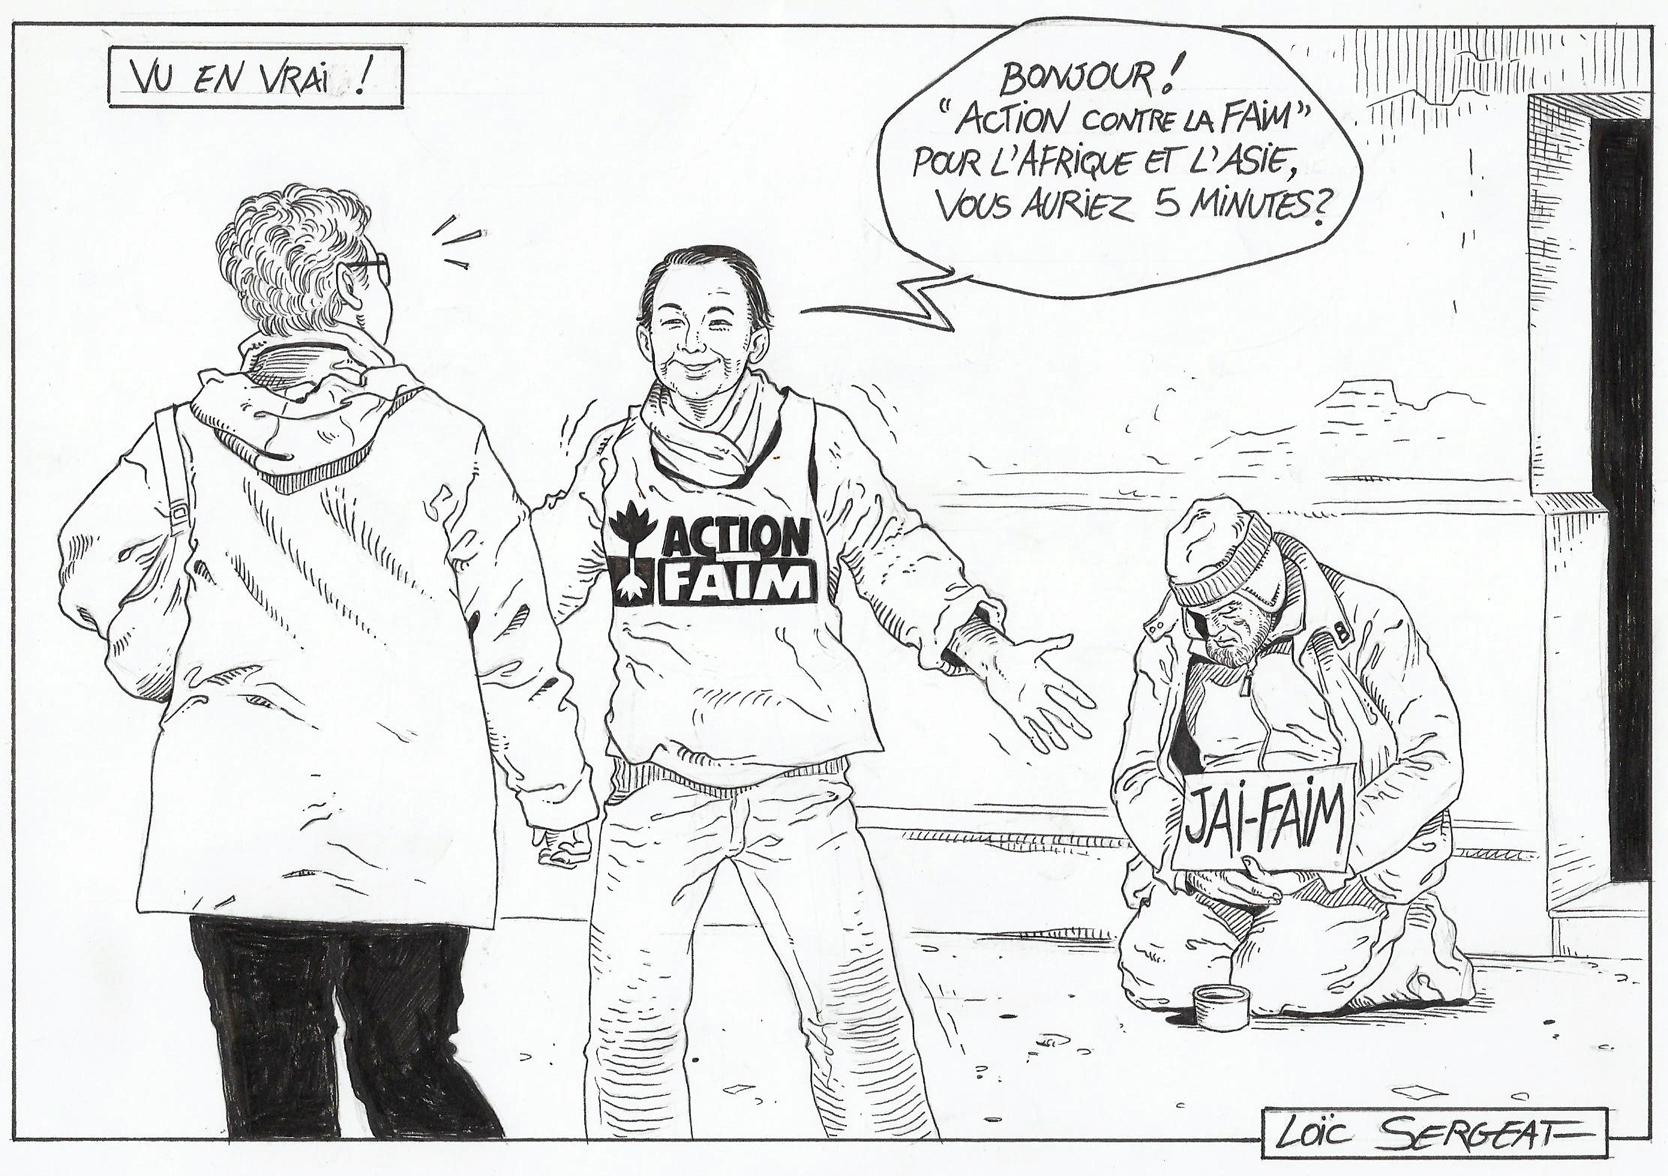 http://www.egaliteetreconciliation.fr/IMG/jpg/Loic_Sergeat_action_contre_la_faim.jpg